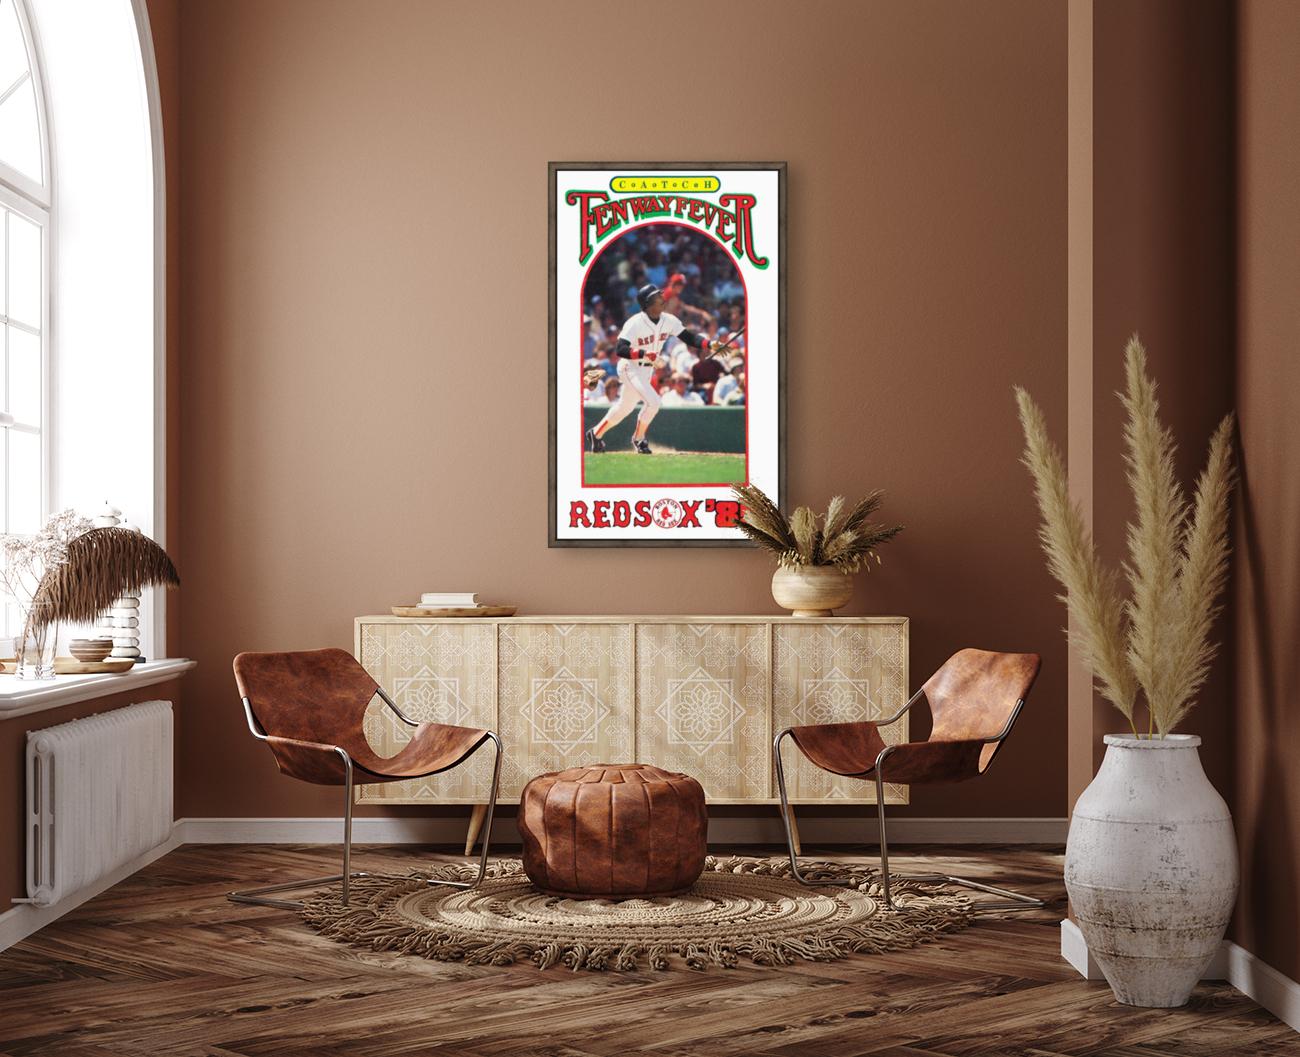 1985 Boston Red Sox Retro Poster  Art